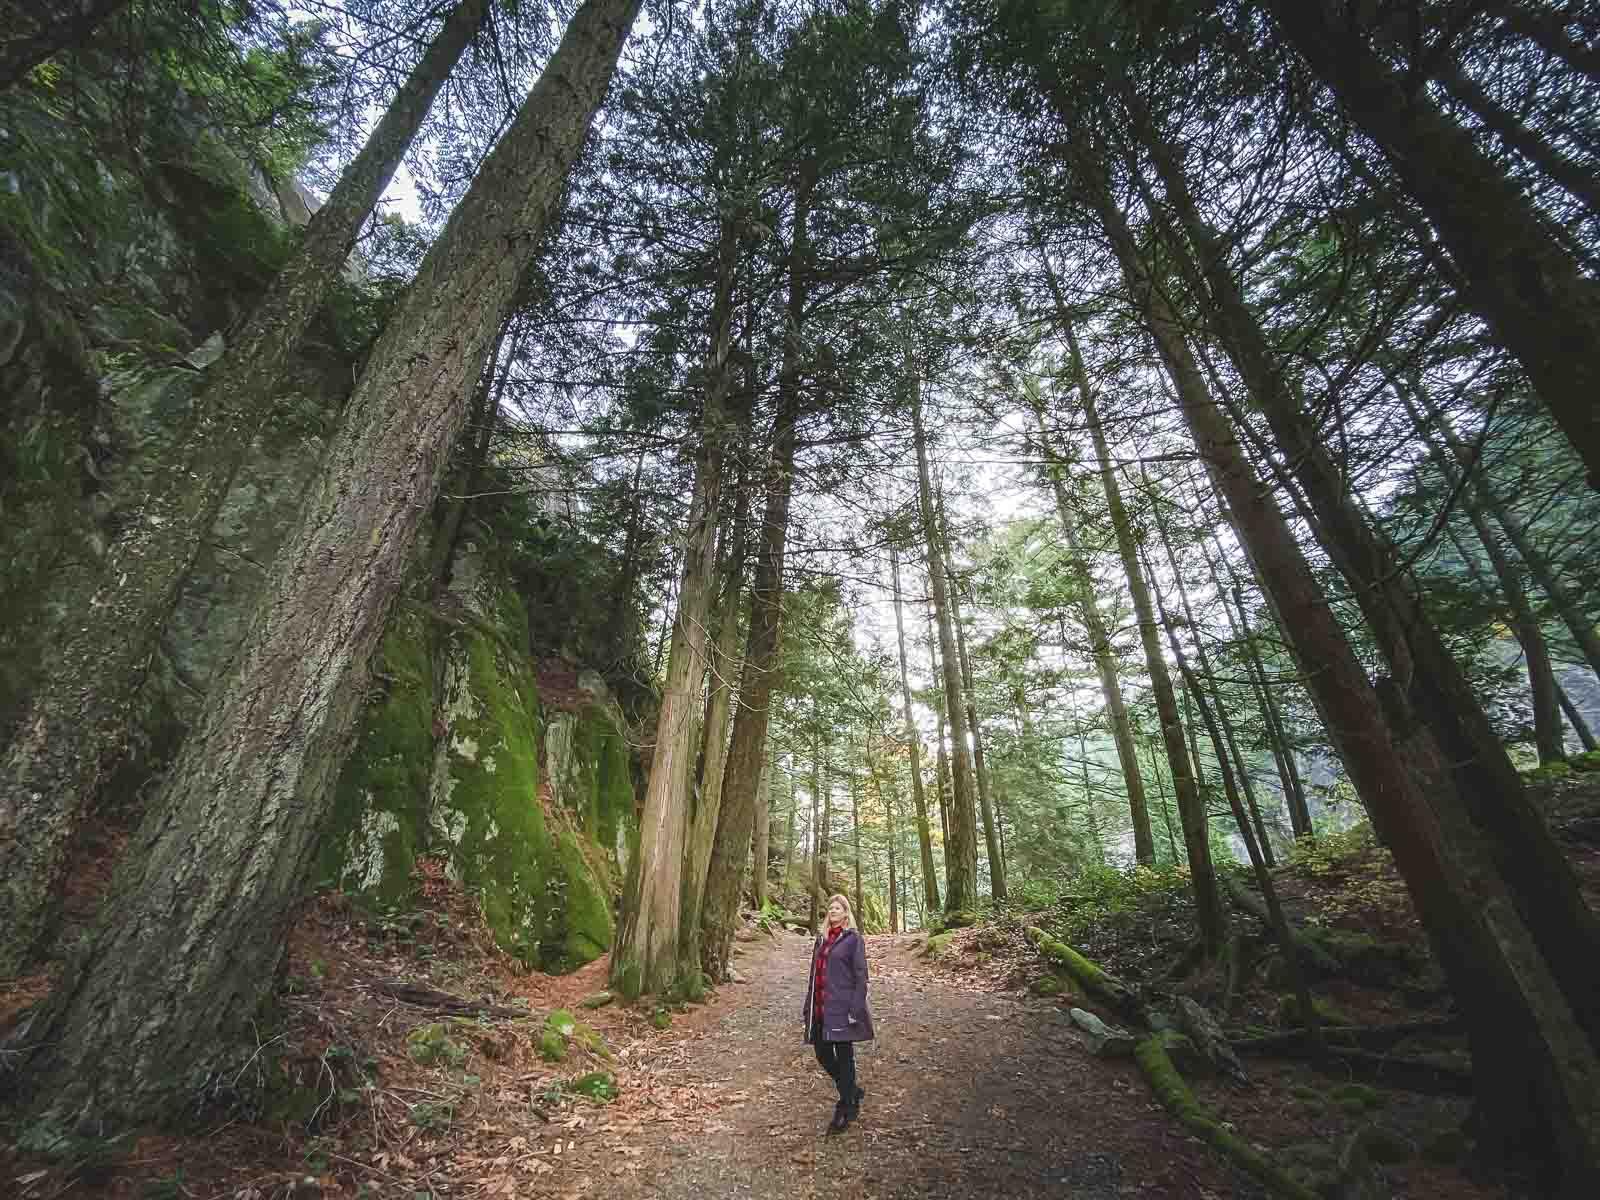 Hiking the trail system near Squamish BC